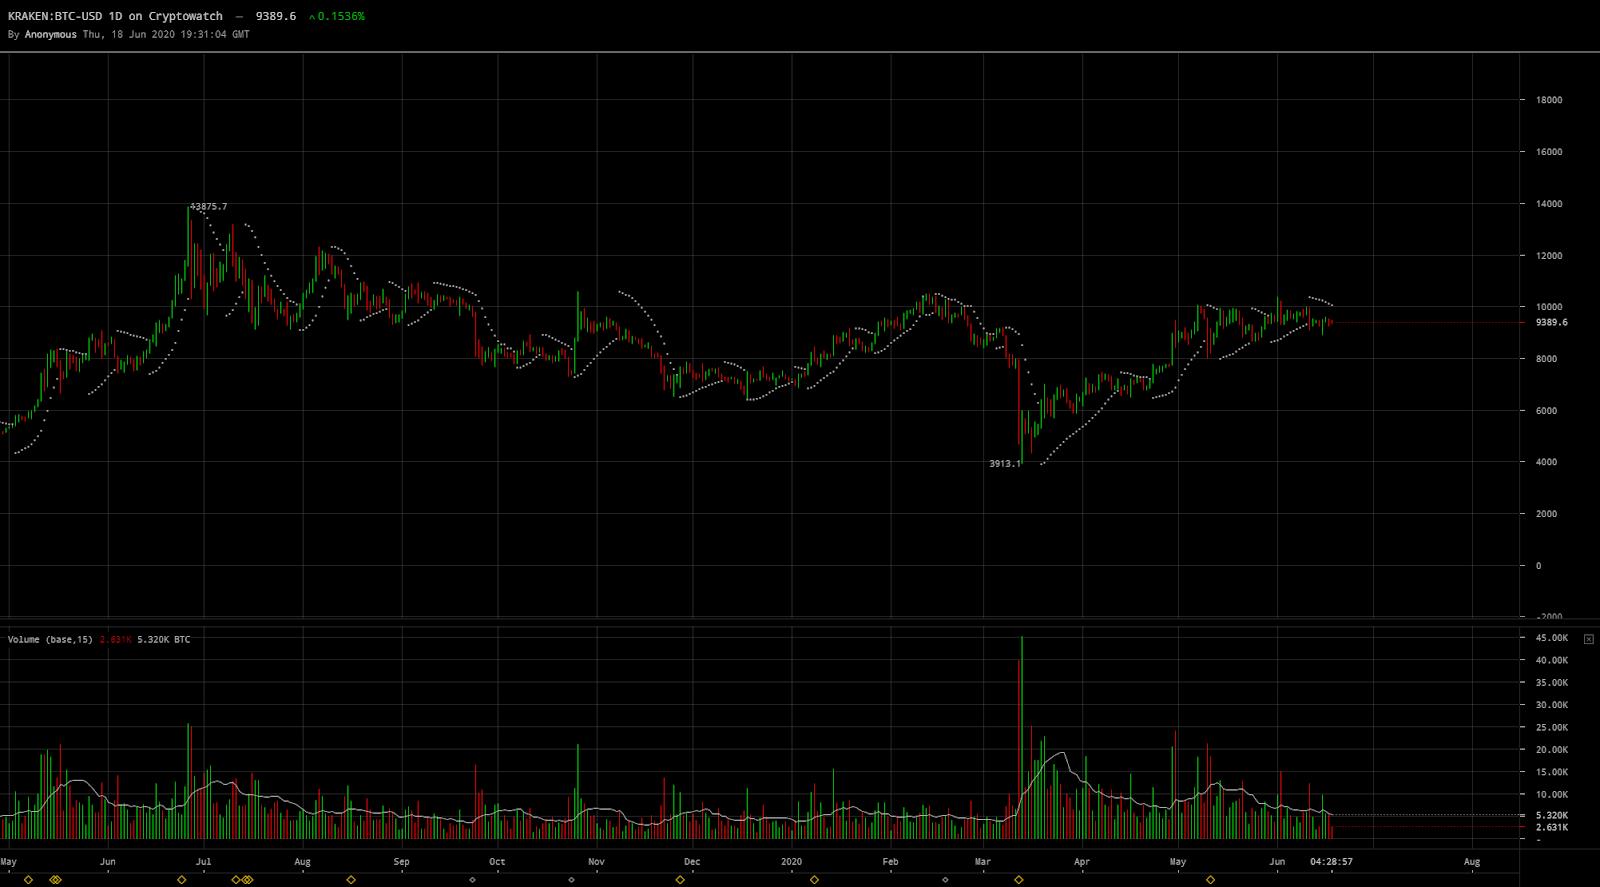 I volumi di BTC USD rimangono alti su Kraken